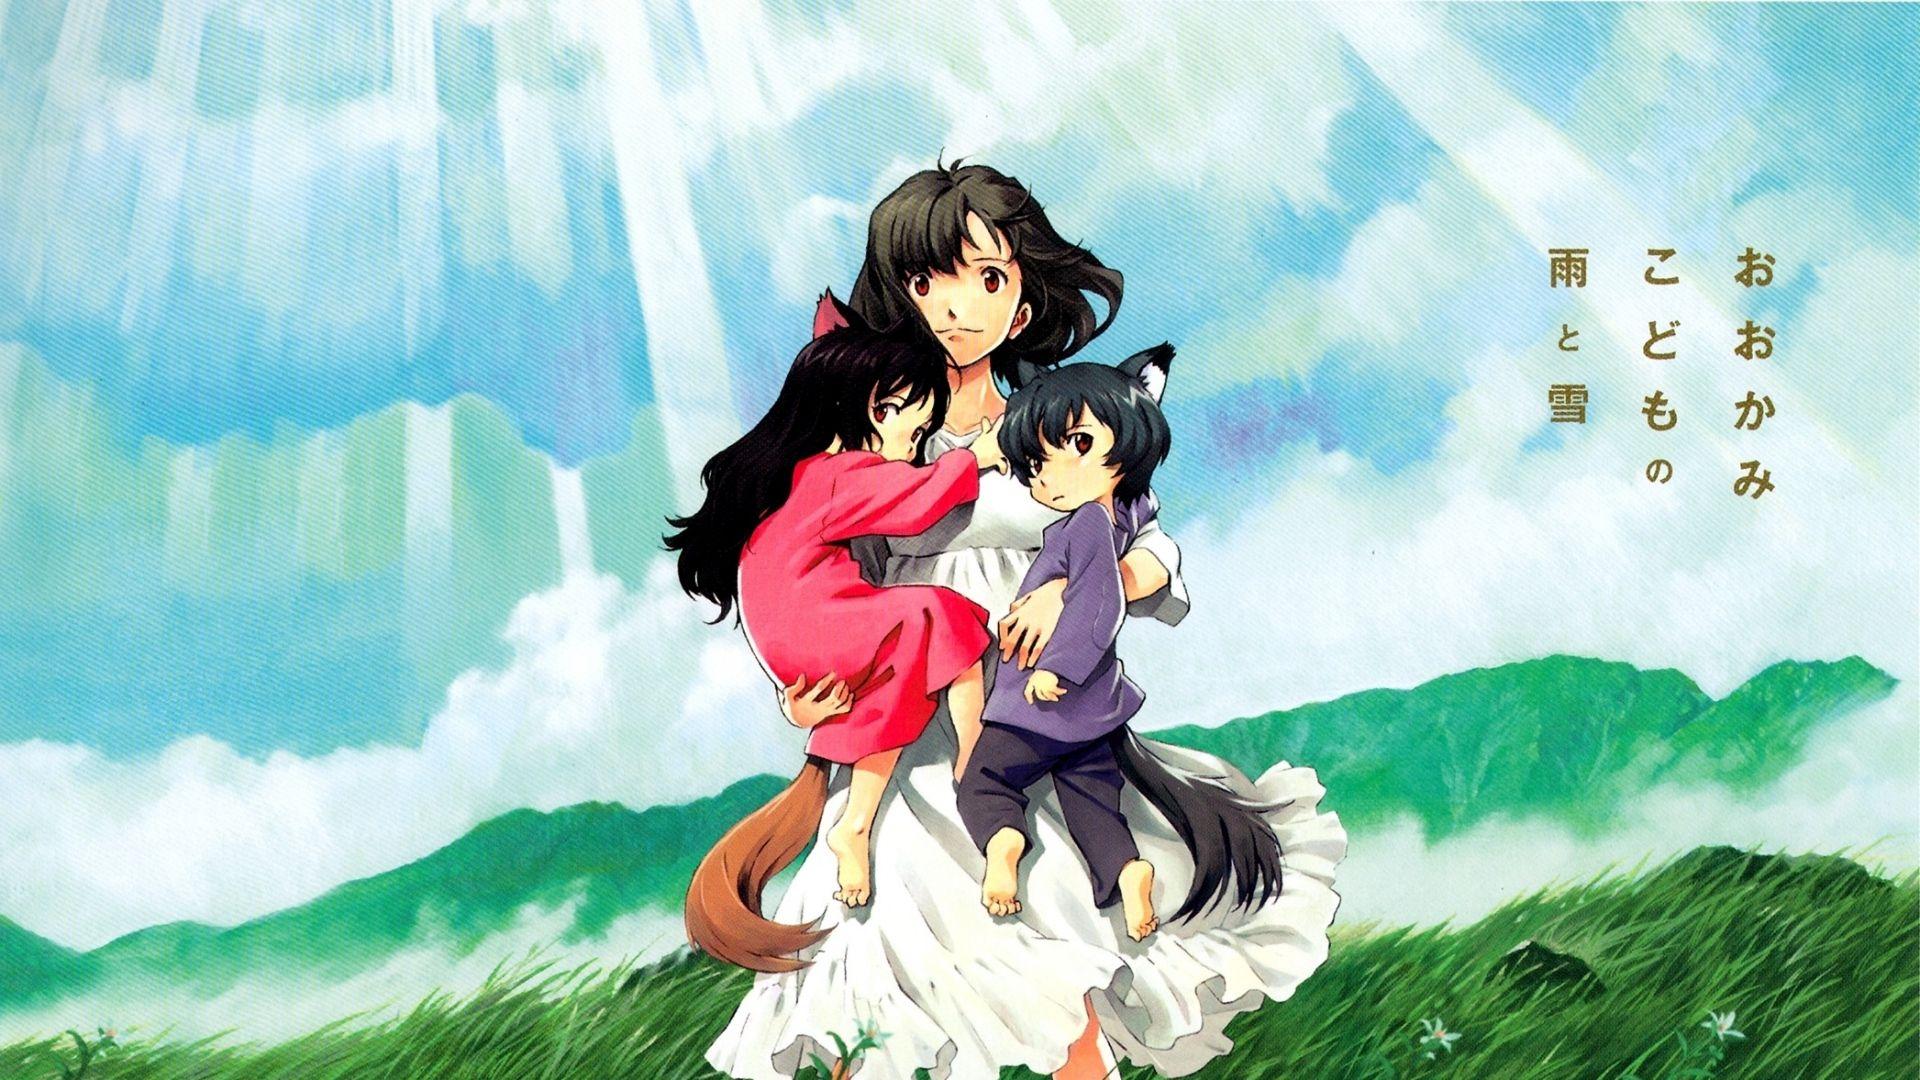 X Wallpaper Wolf Children Ame And Yuki Anime Girl Children Grass